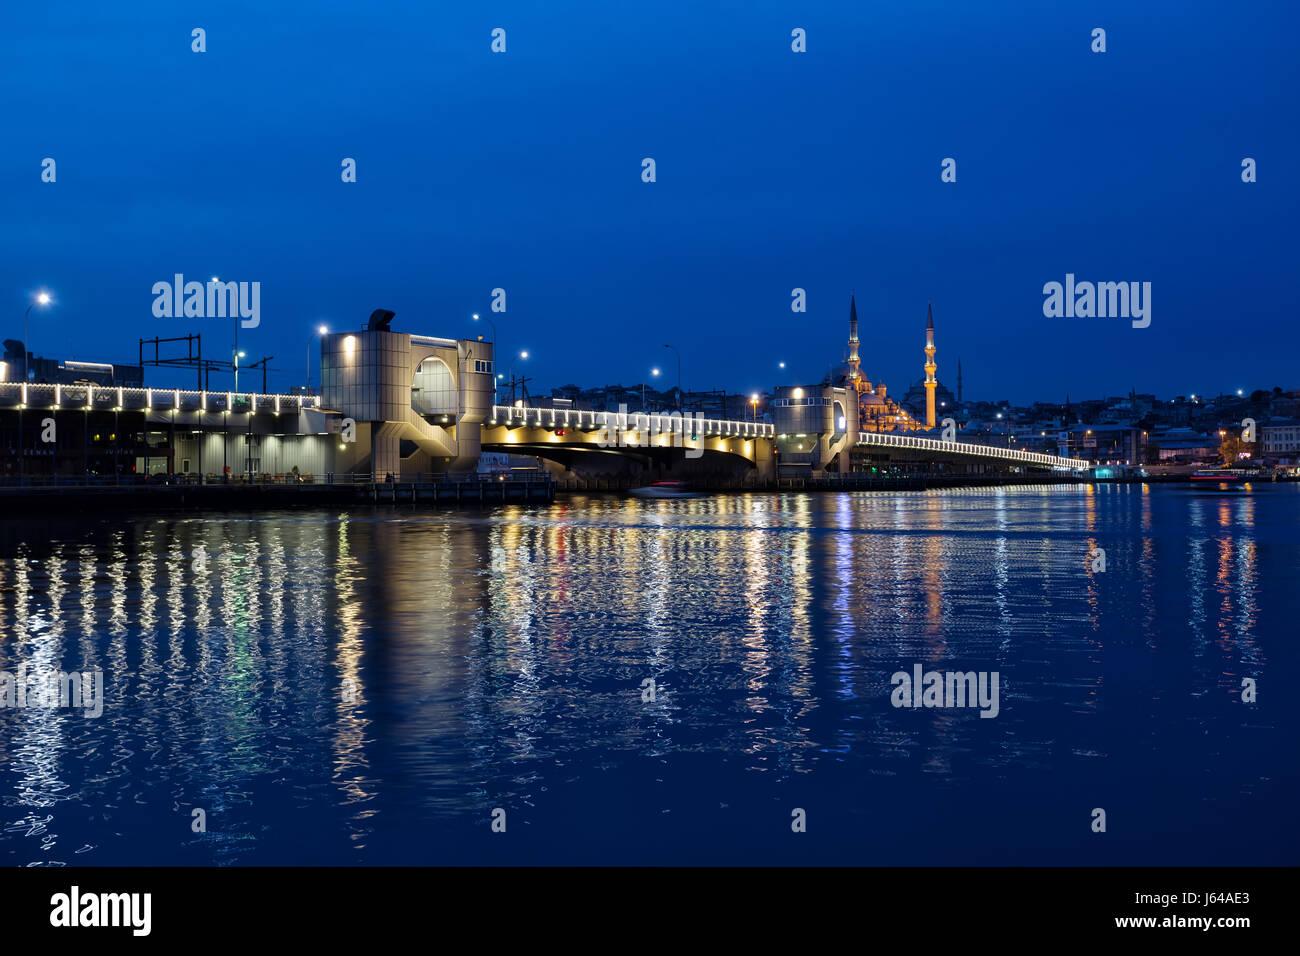 Galata bridge across the Bosphorus in the Istanbul at night. Istanbul, Turkey. - Stock Image